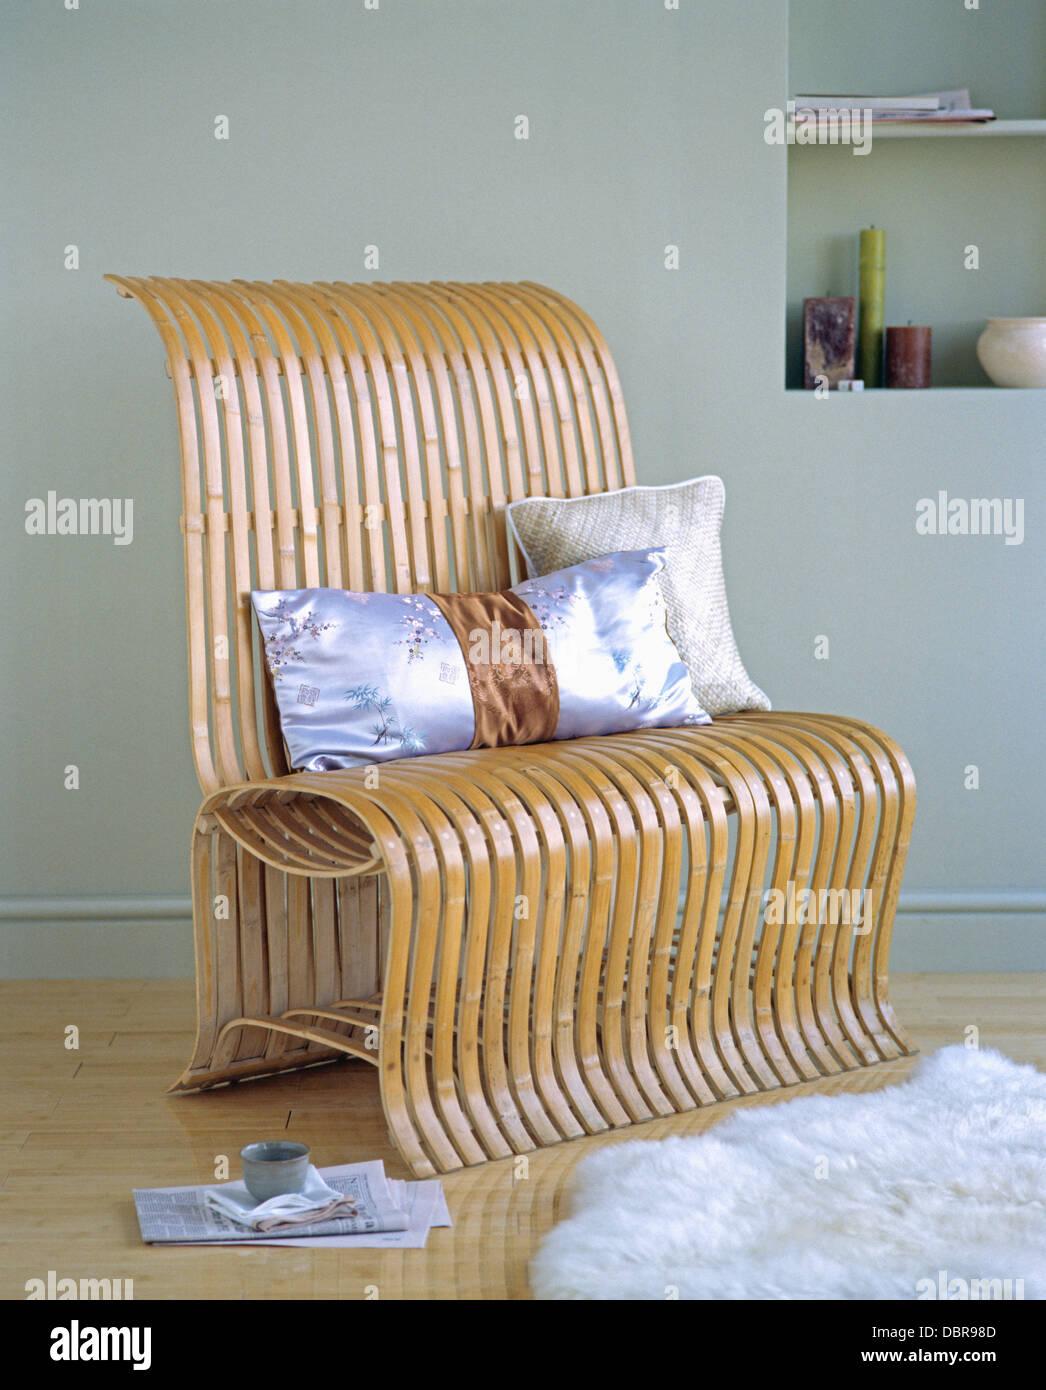 gebogene bambus stuhl mit seidenkissen in nahaufnahme stockfoto